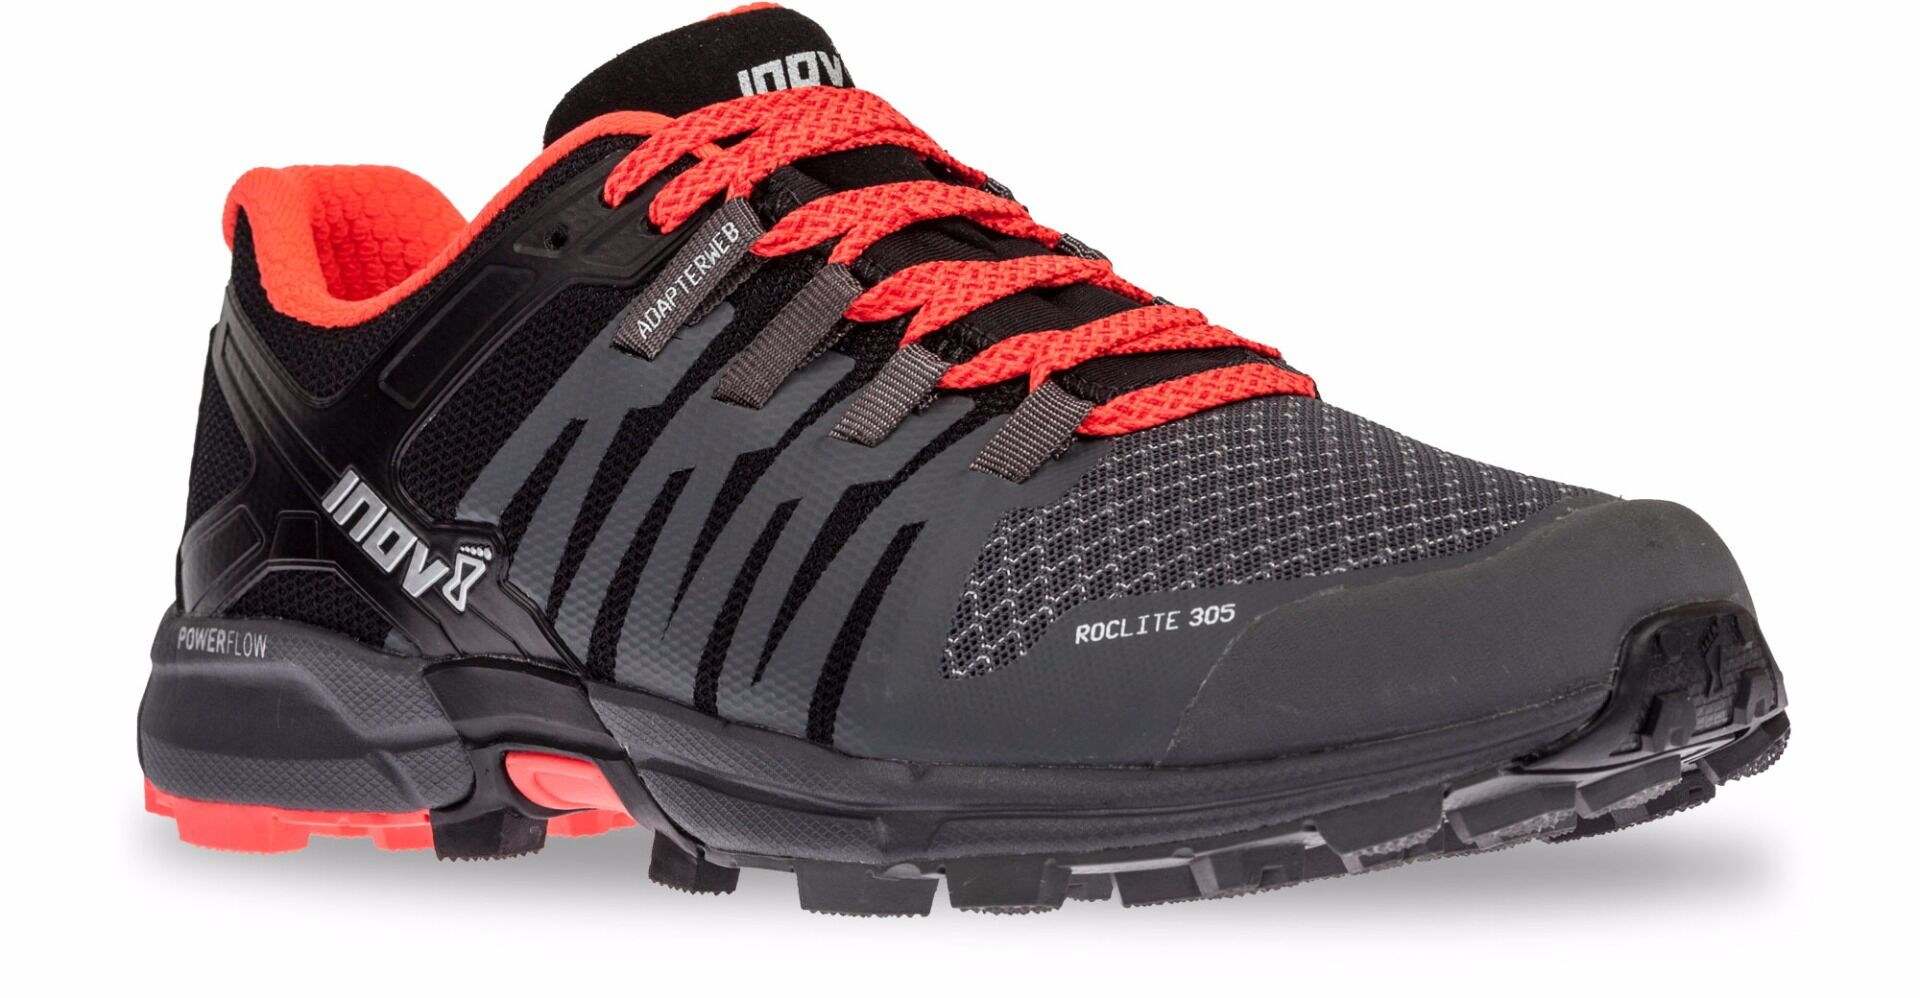 Roclite 305 Women's Trail Running Shoe